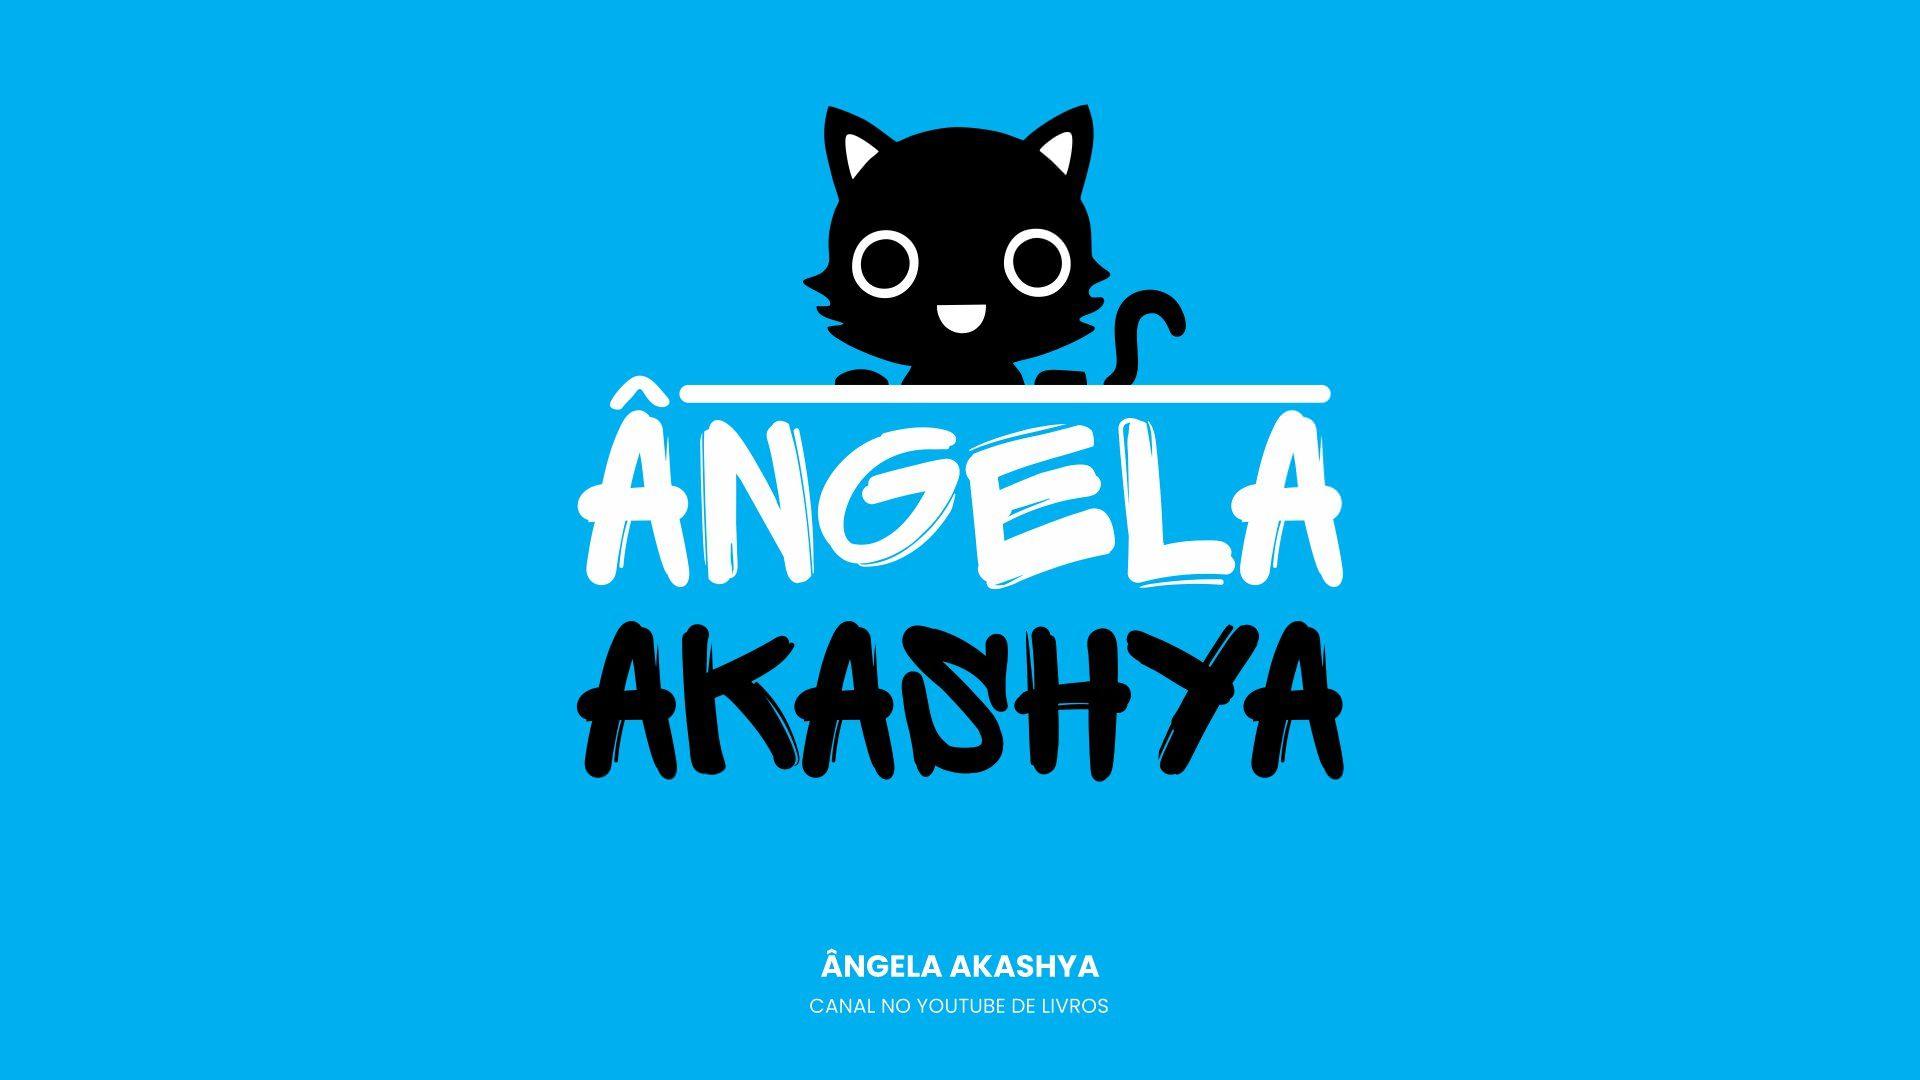 angela akashya